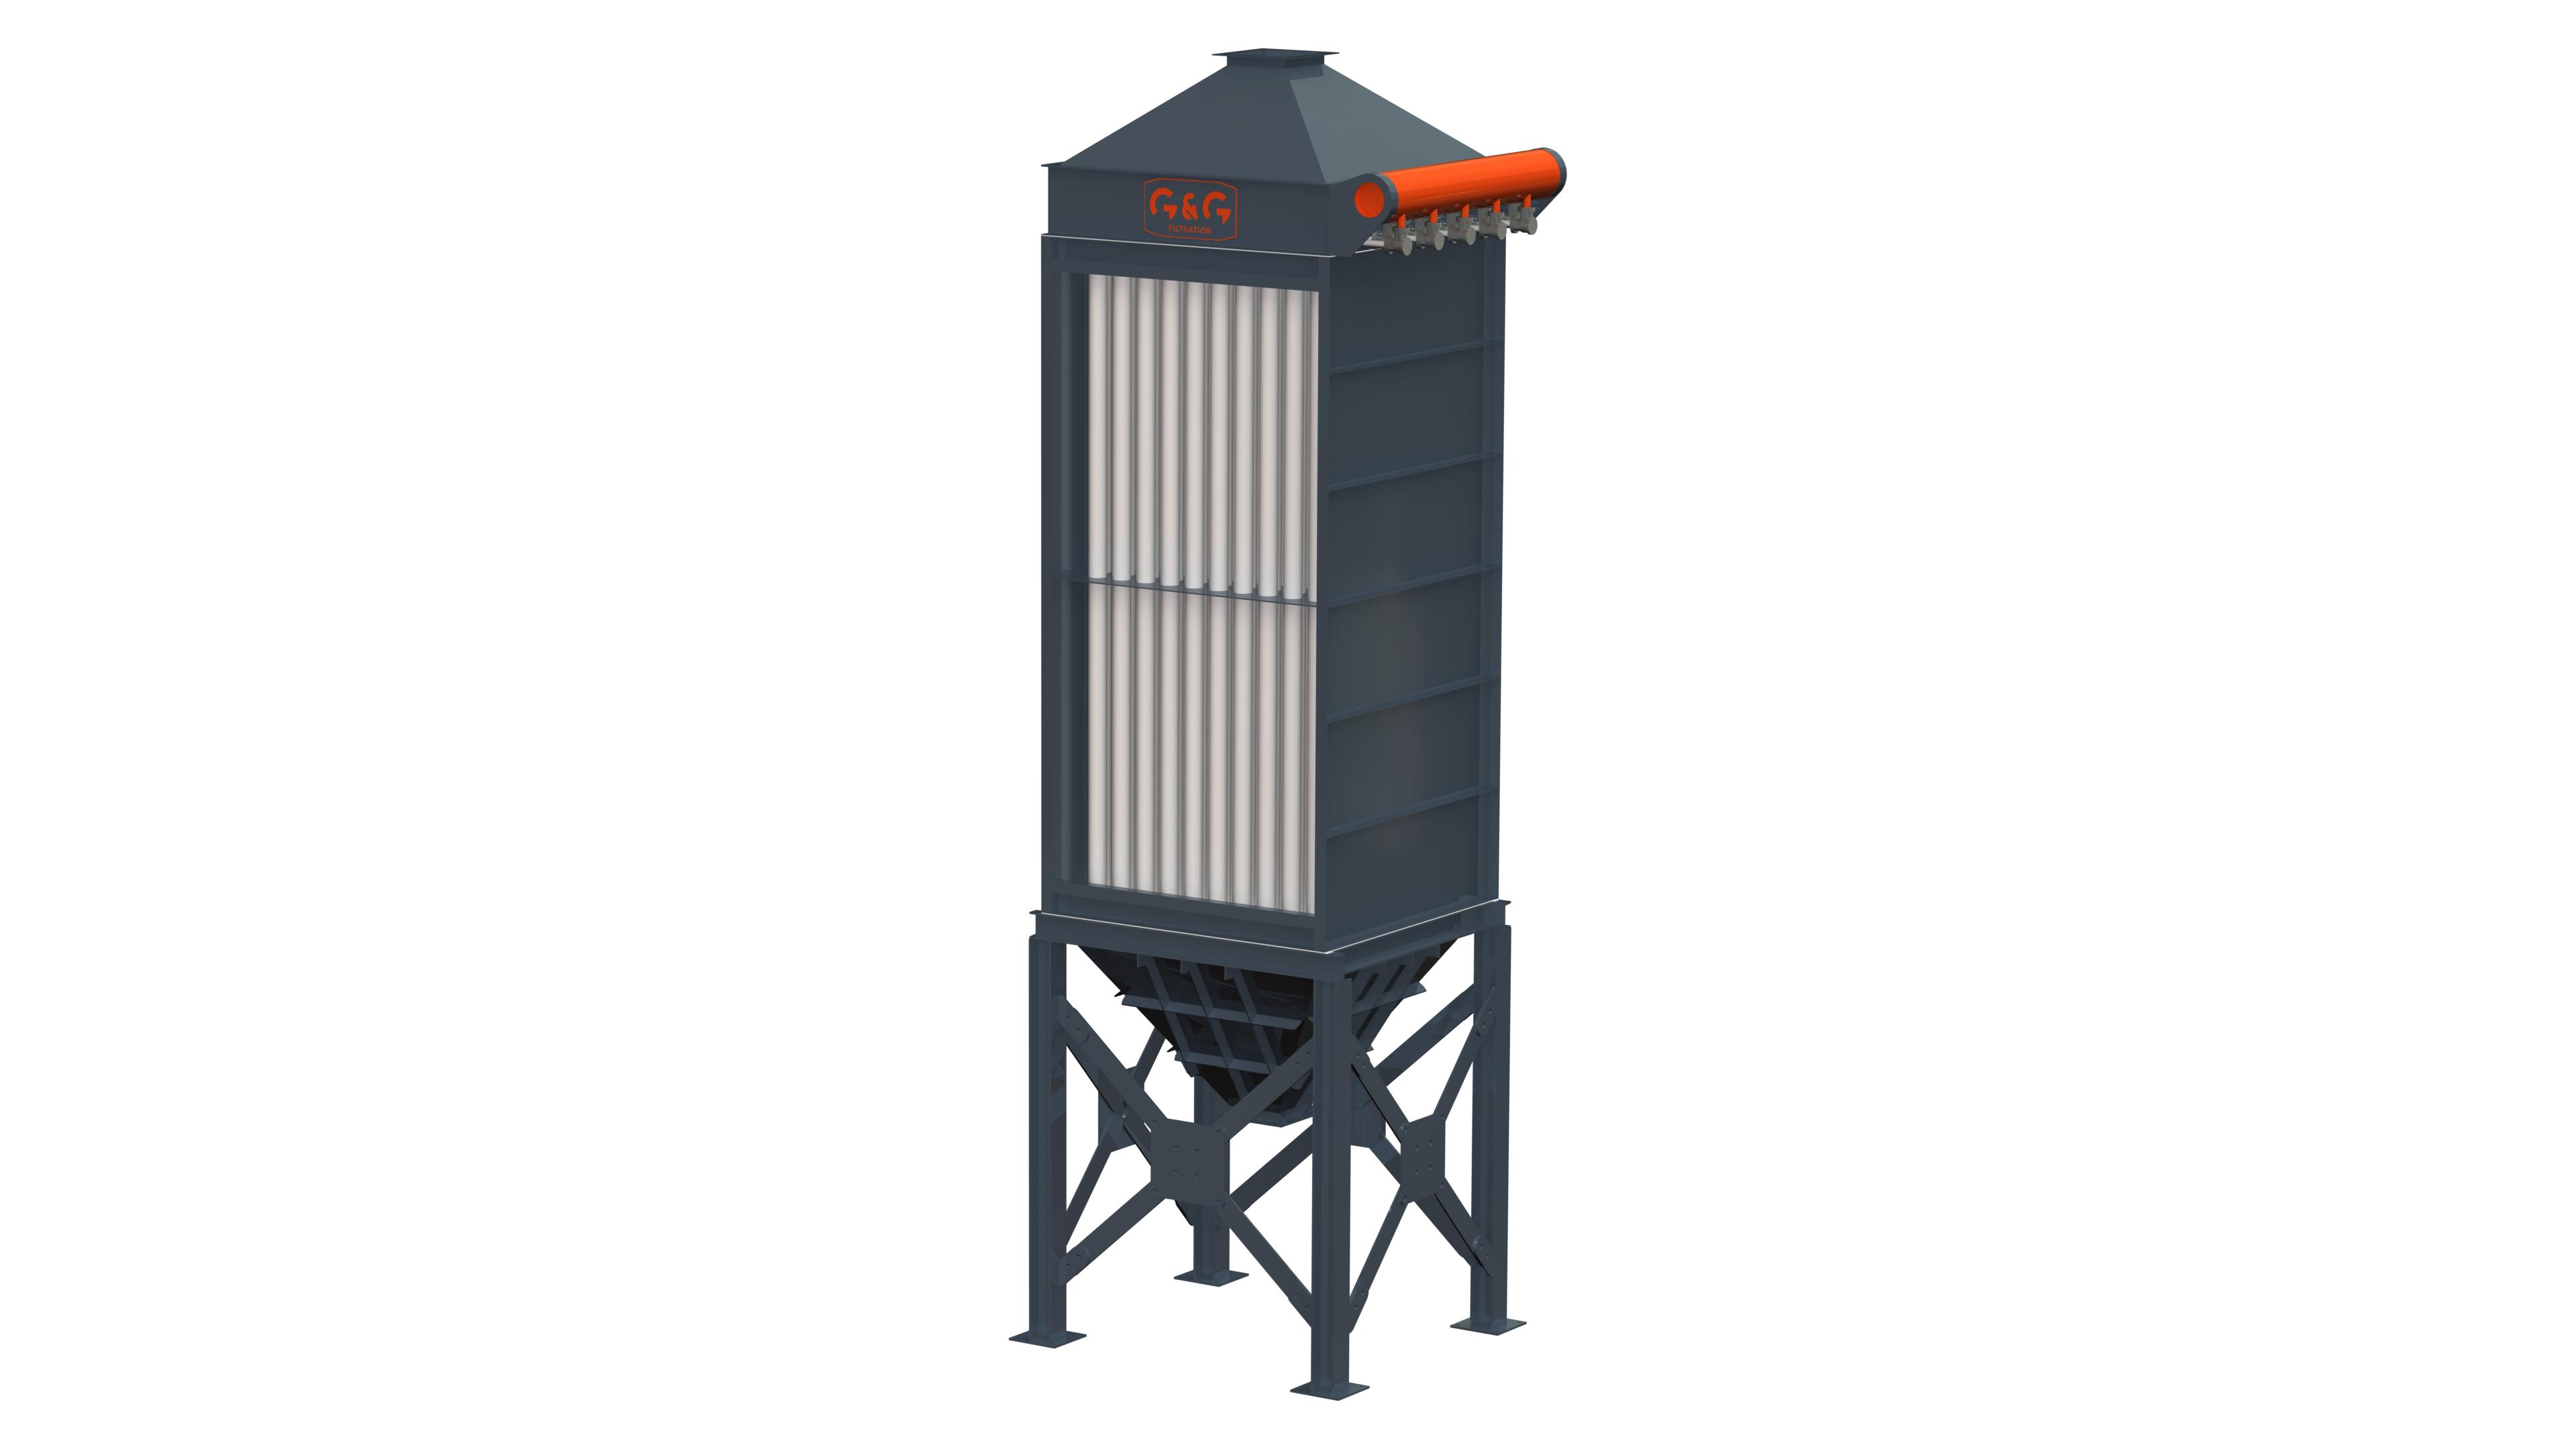 Rekuperatori dimnih gasova